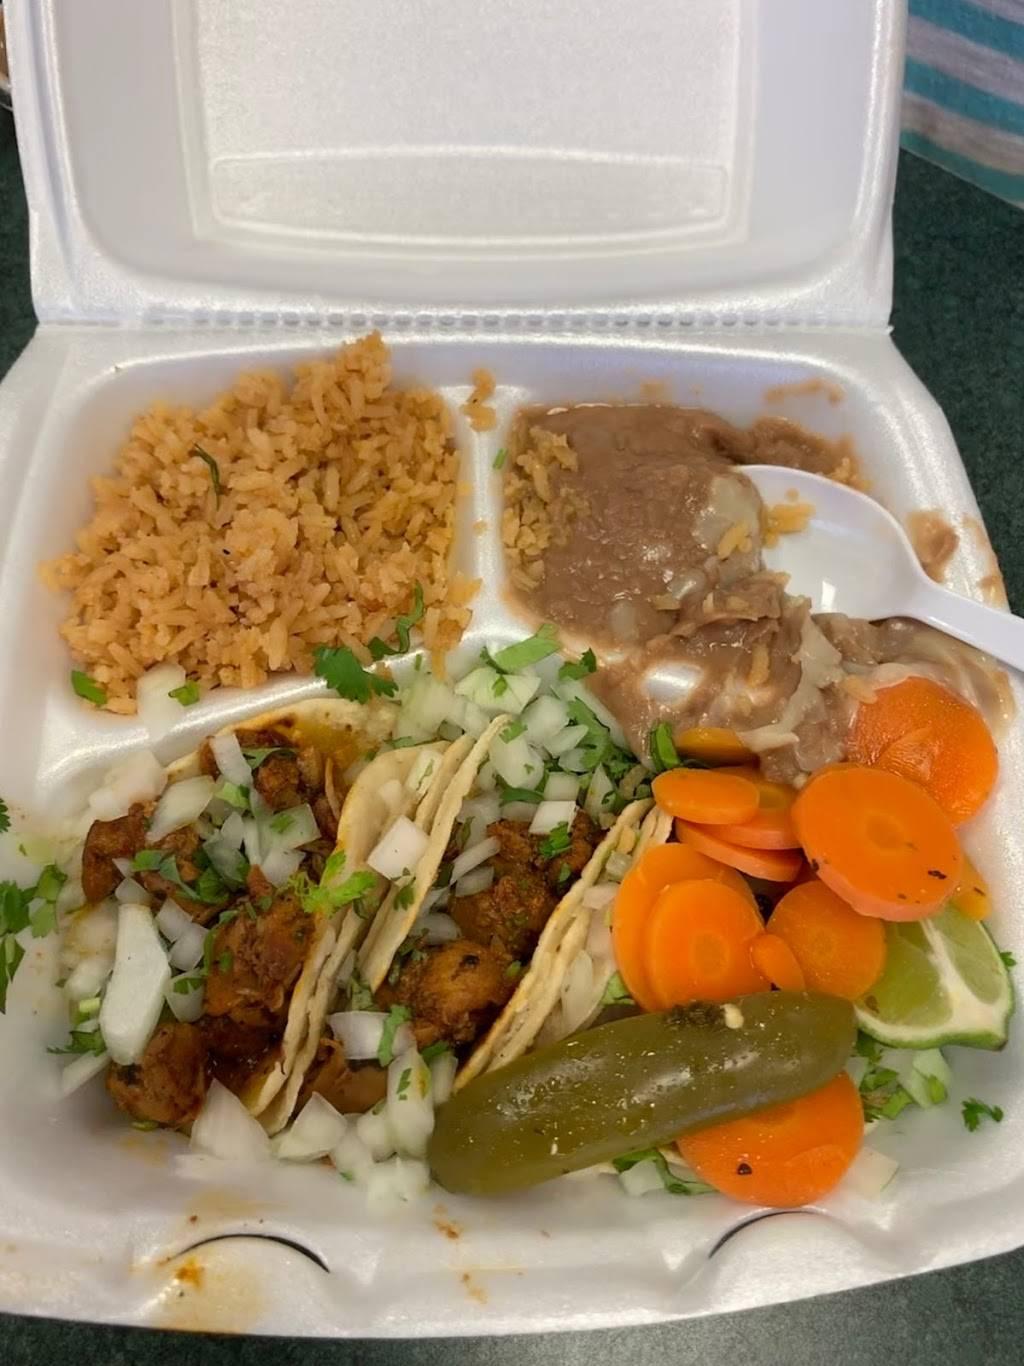 Taqueria Express #2 | restaurant | 2119 S Garnett Rd, Tulsa, OK 74129, USA | 9183133615 OR +1 918-313-3615